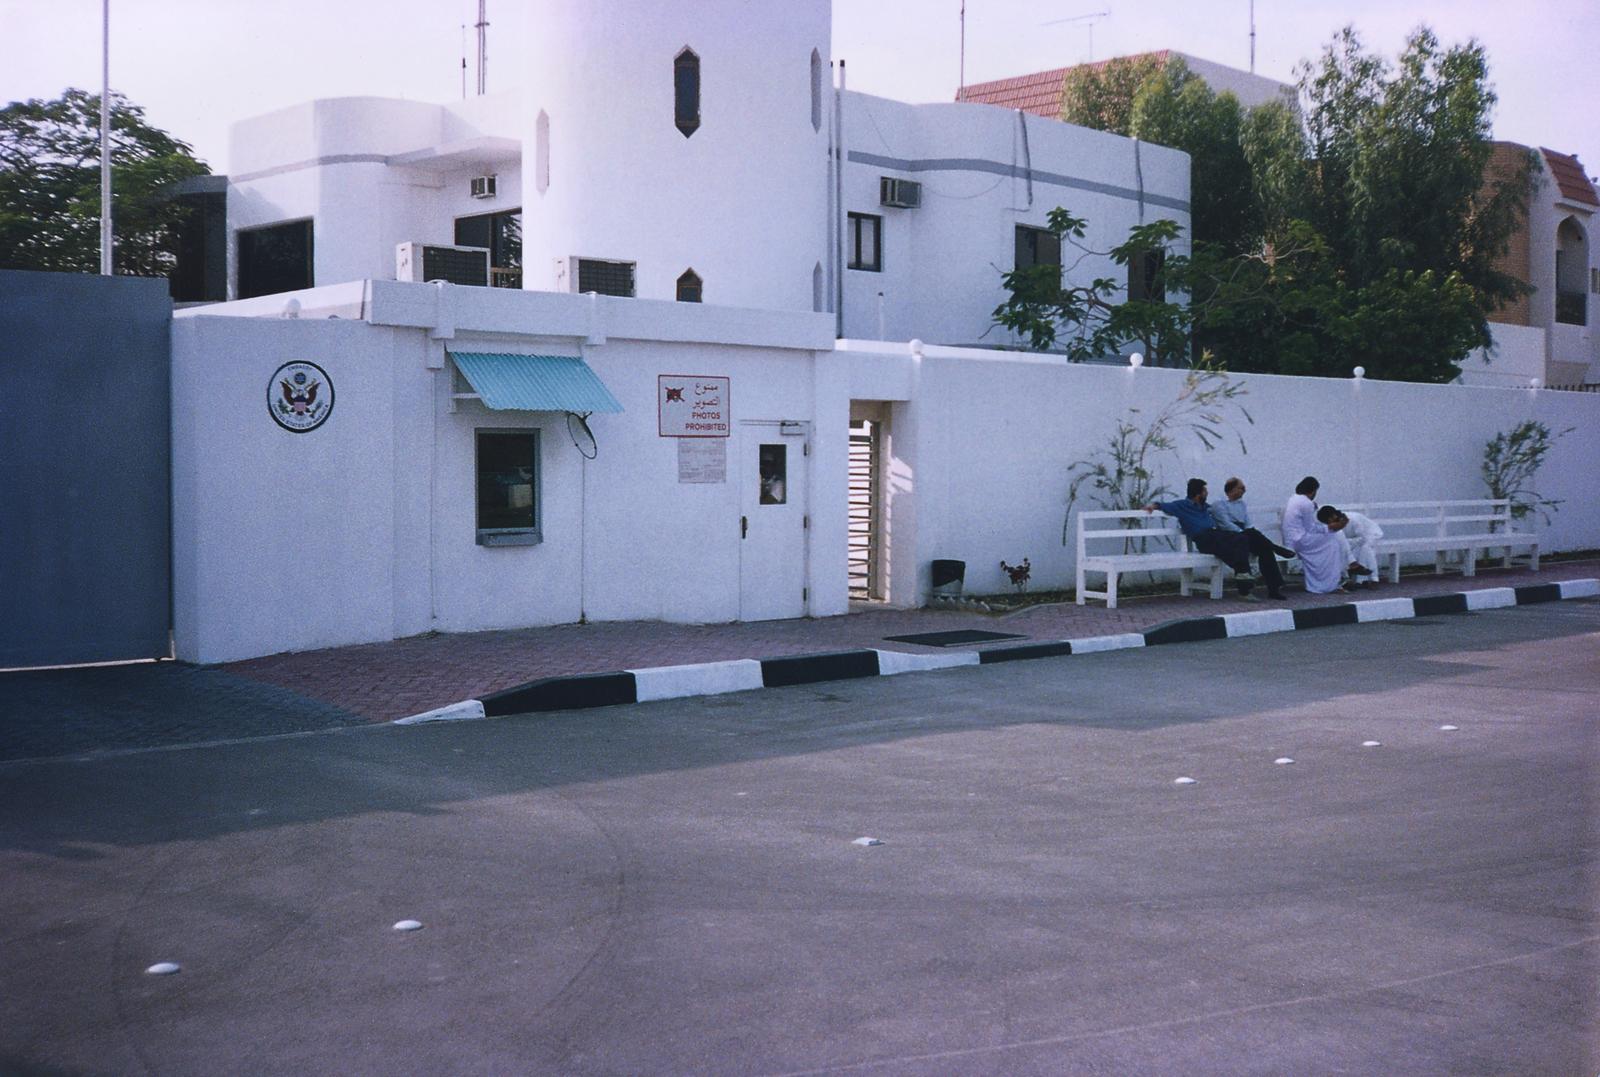 Abu Dhabi - Chancery Office Building